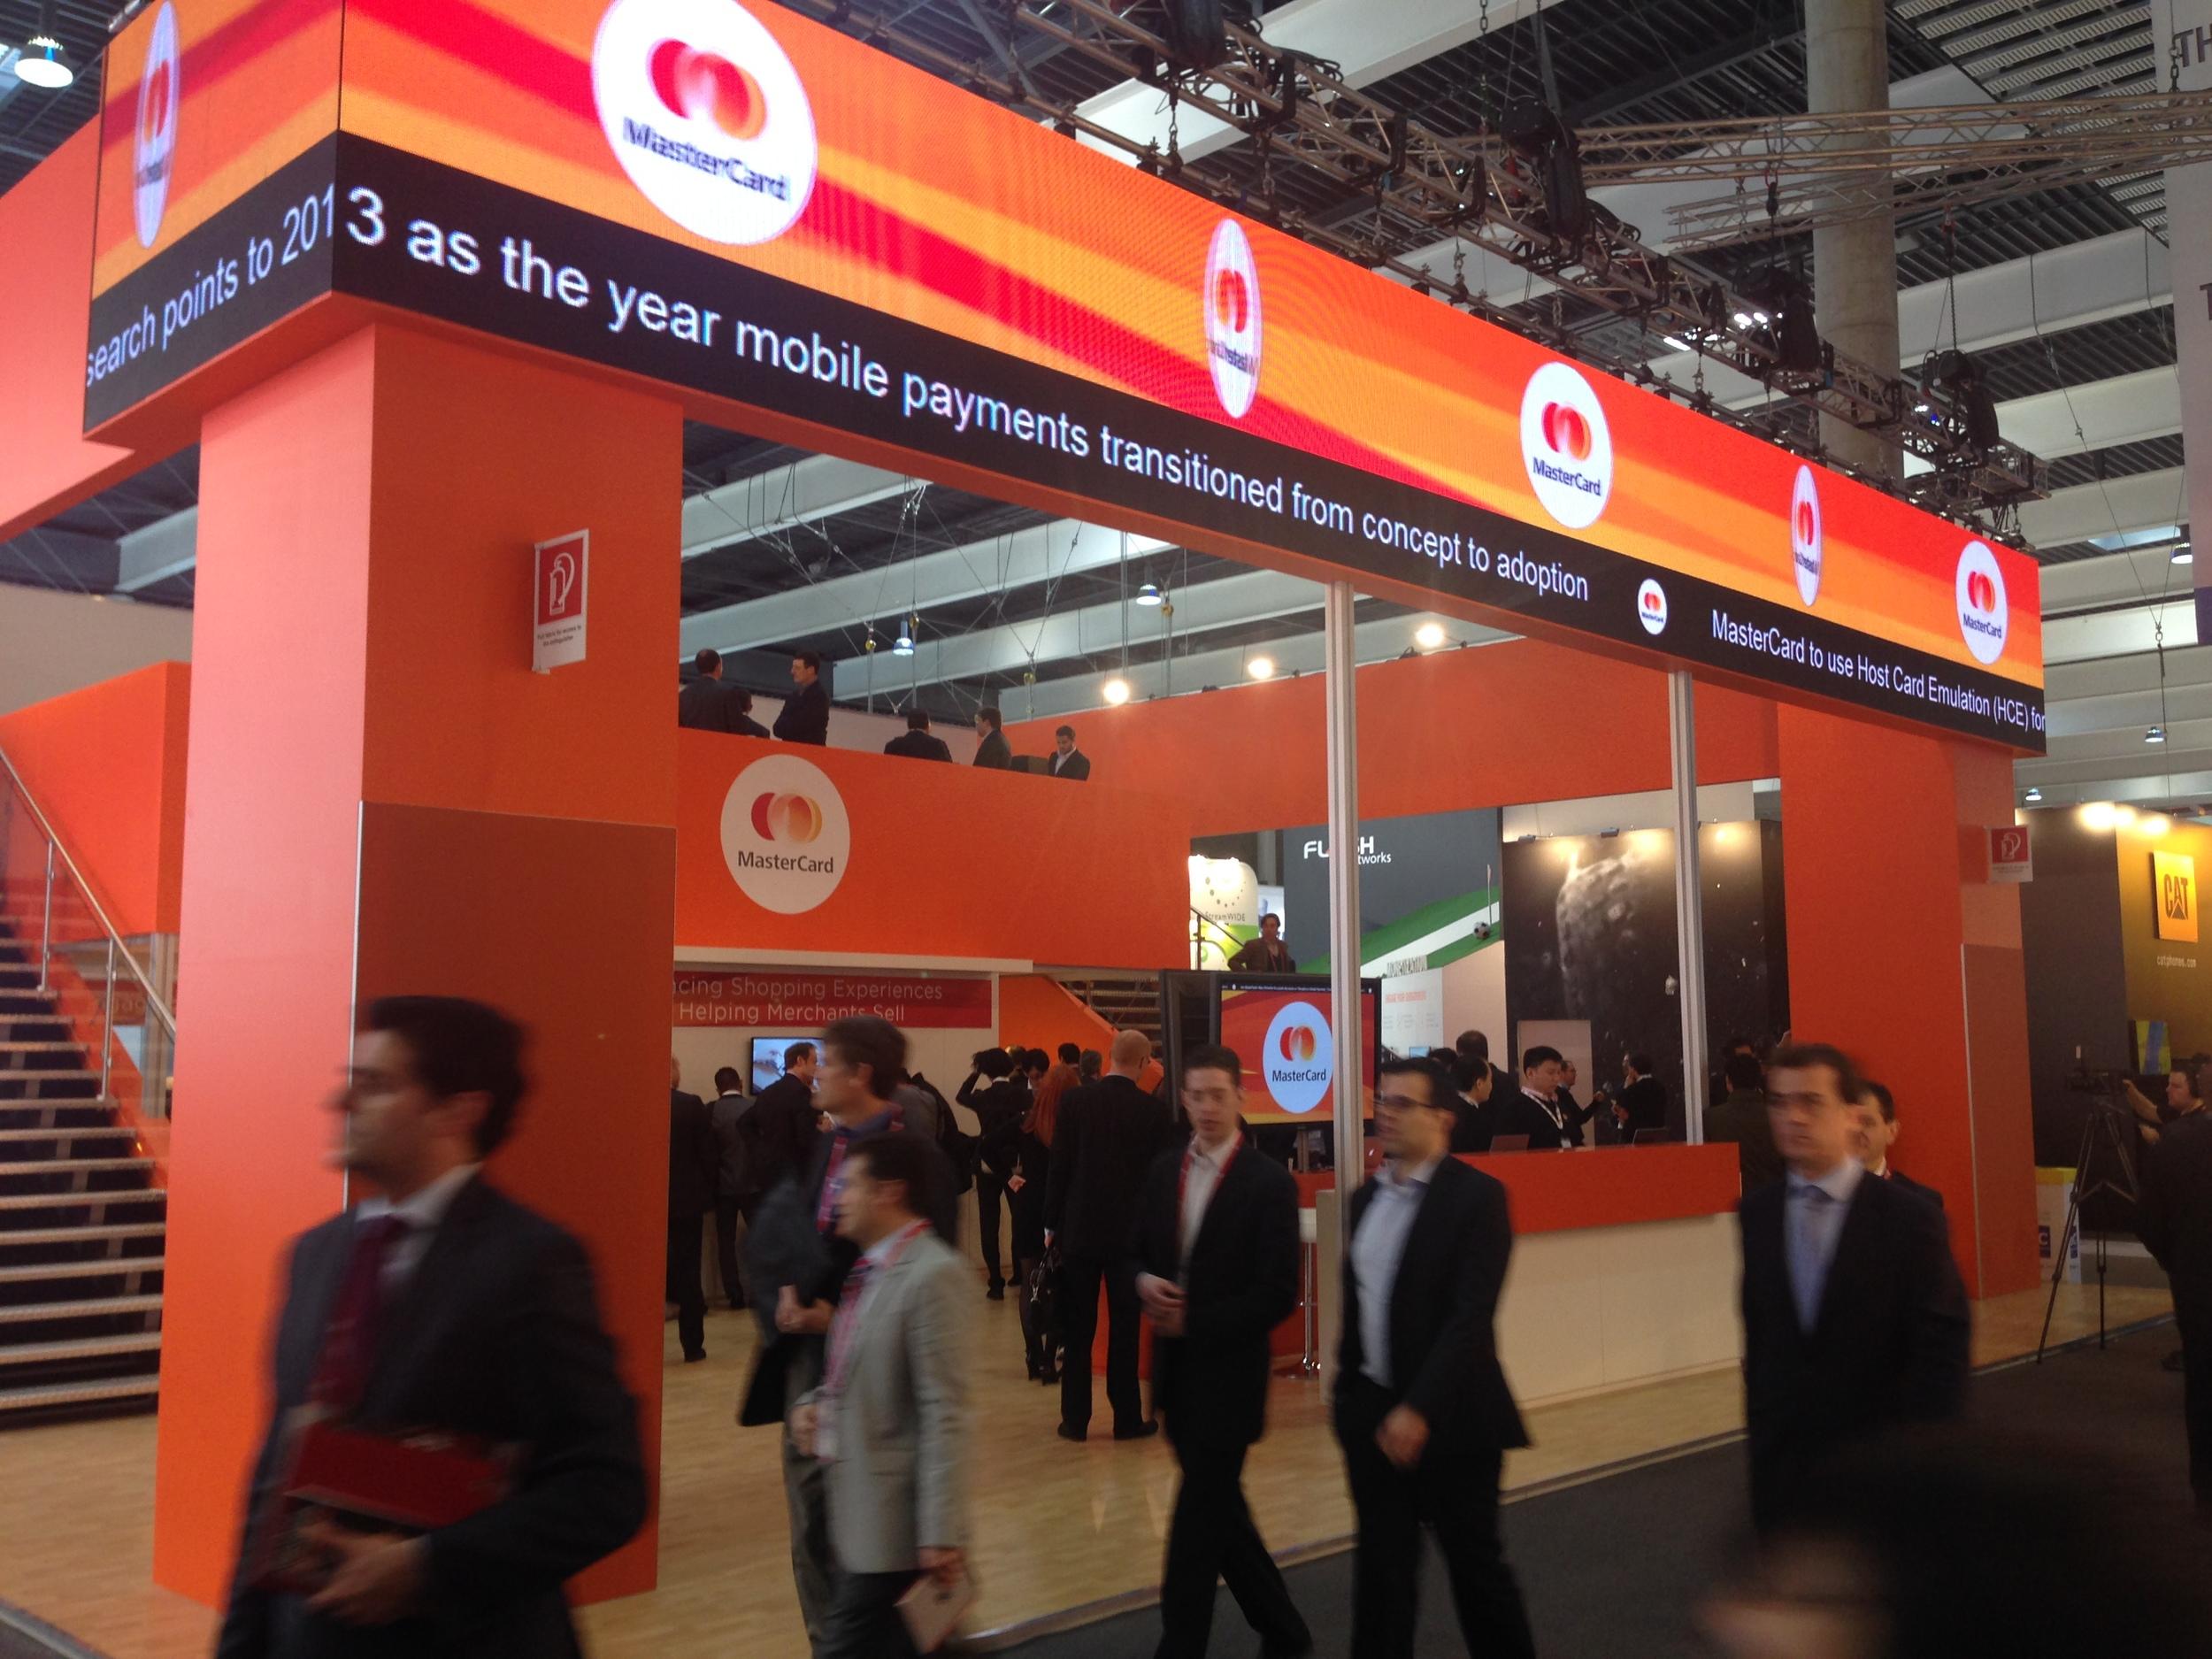 MasterCard at Mobile World Congress 2014